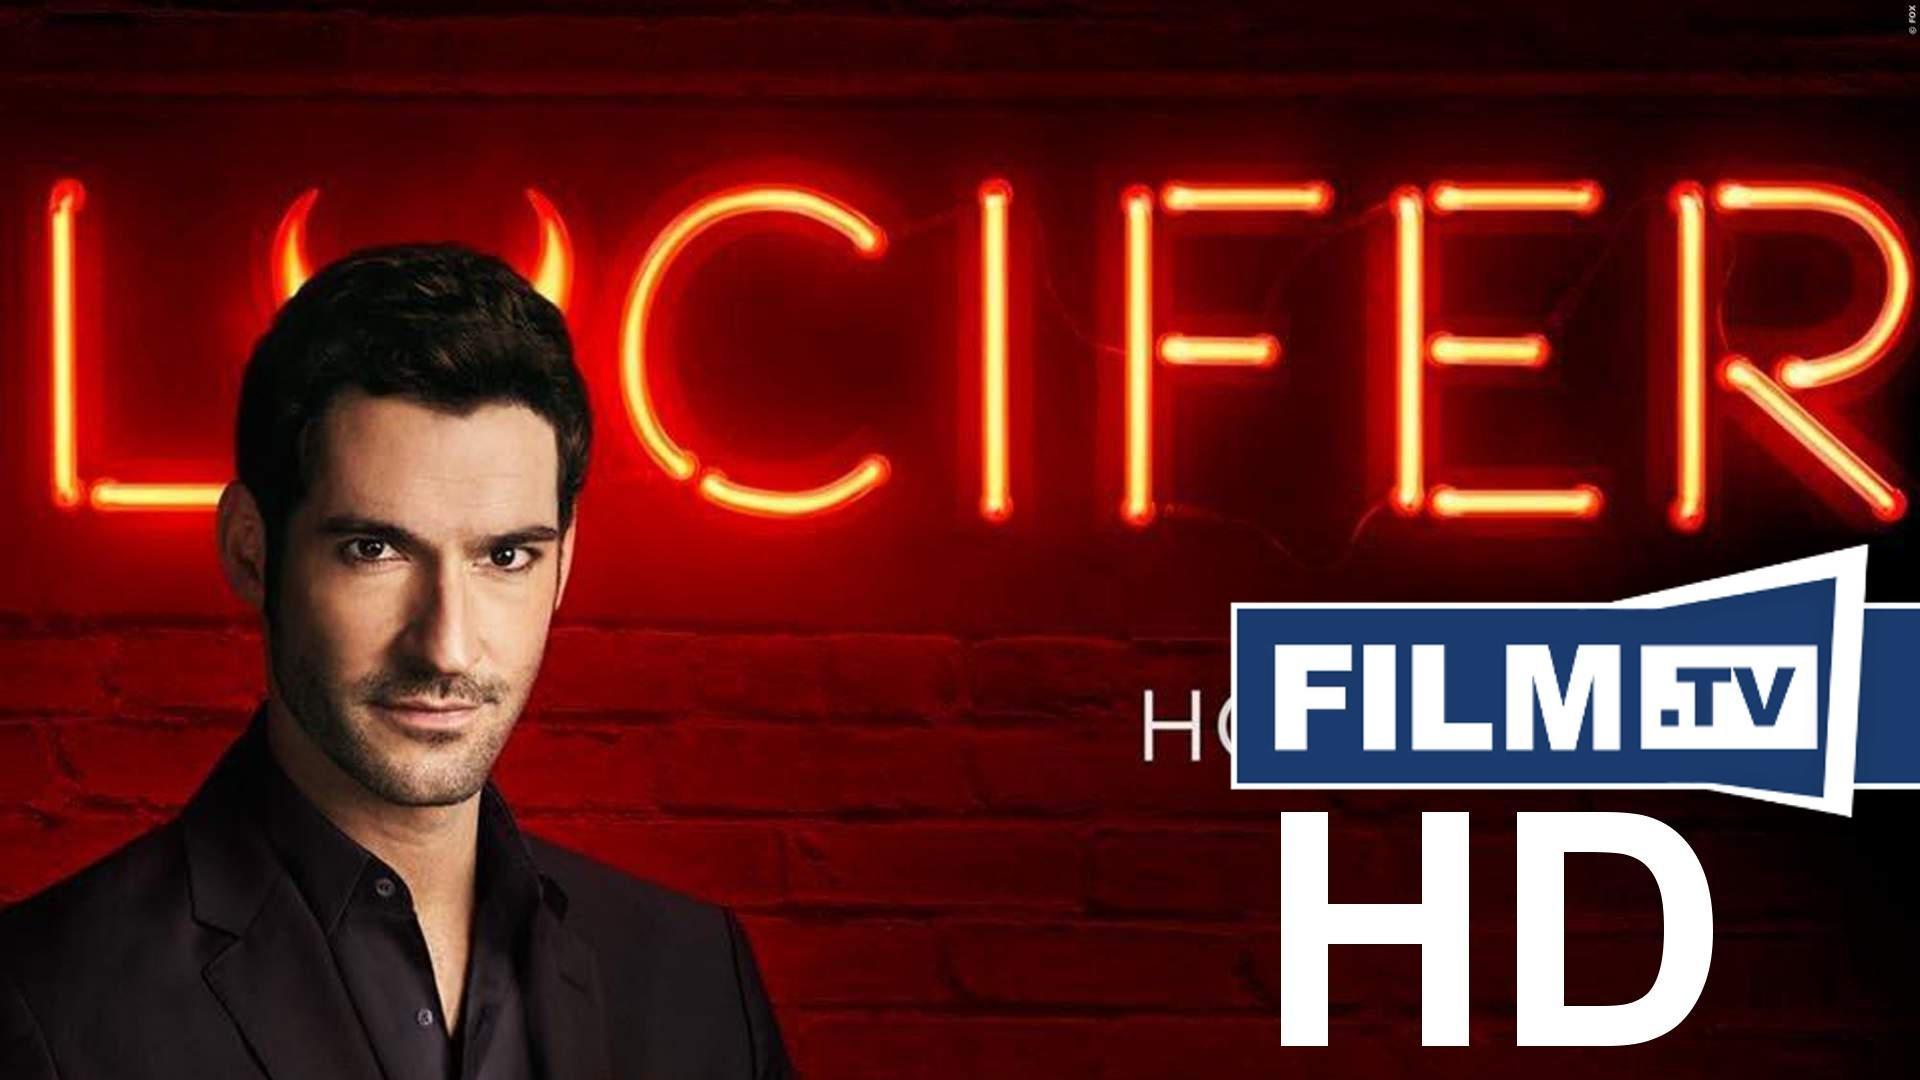 Lucifer Trailer (2016) - US Trailer